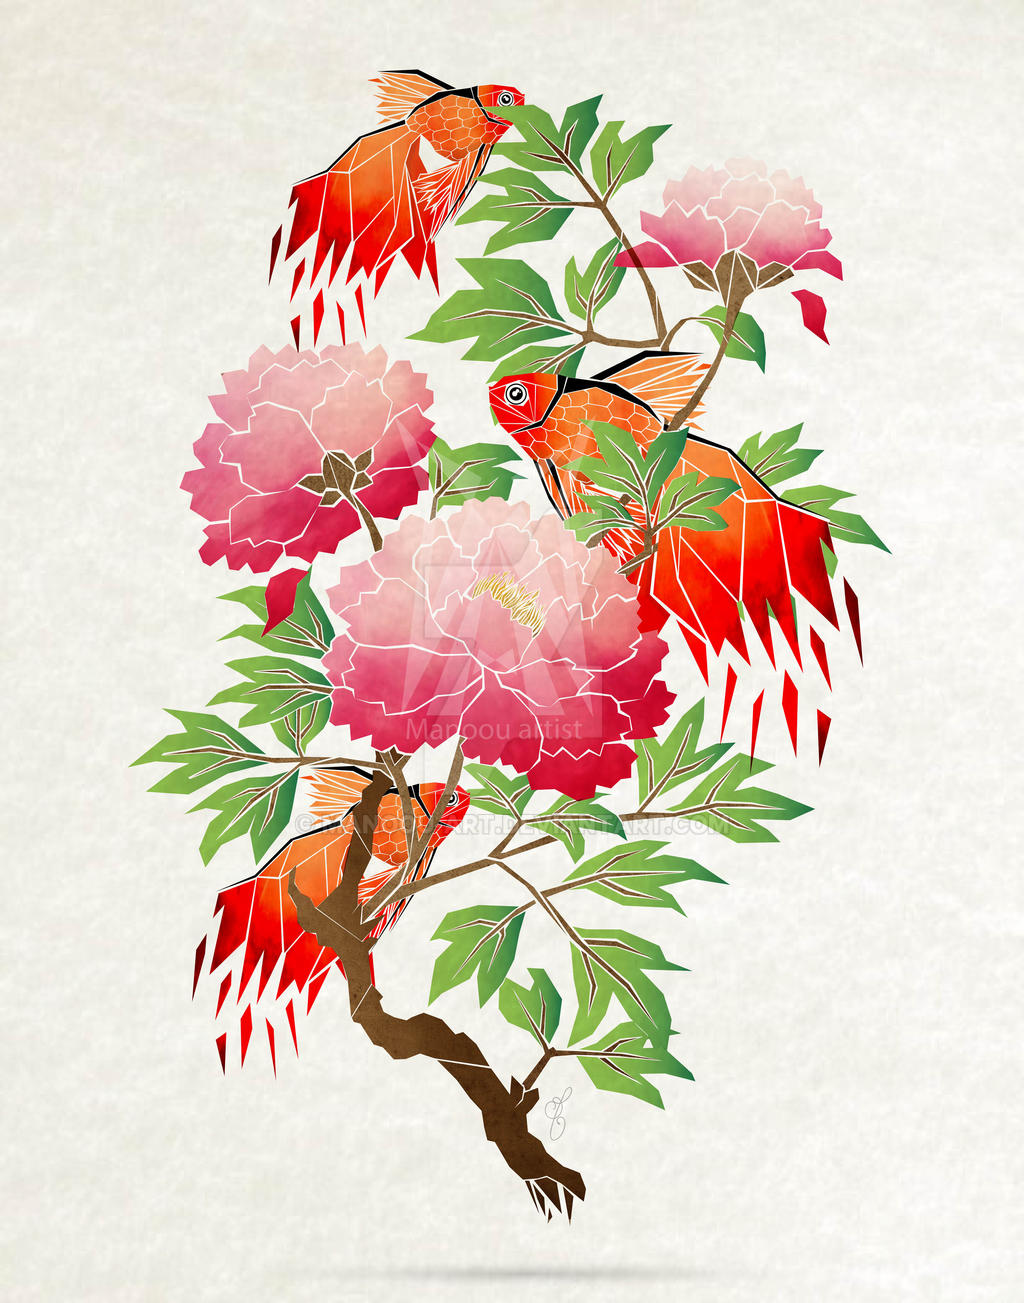 goldfish by MaNoU56